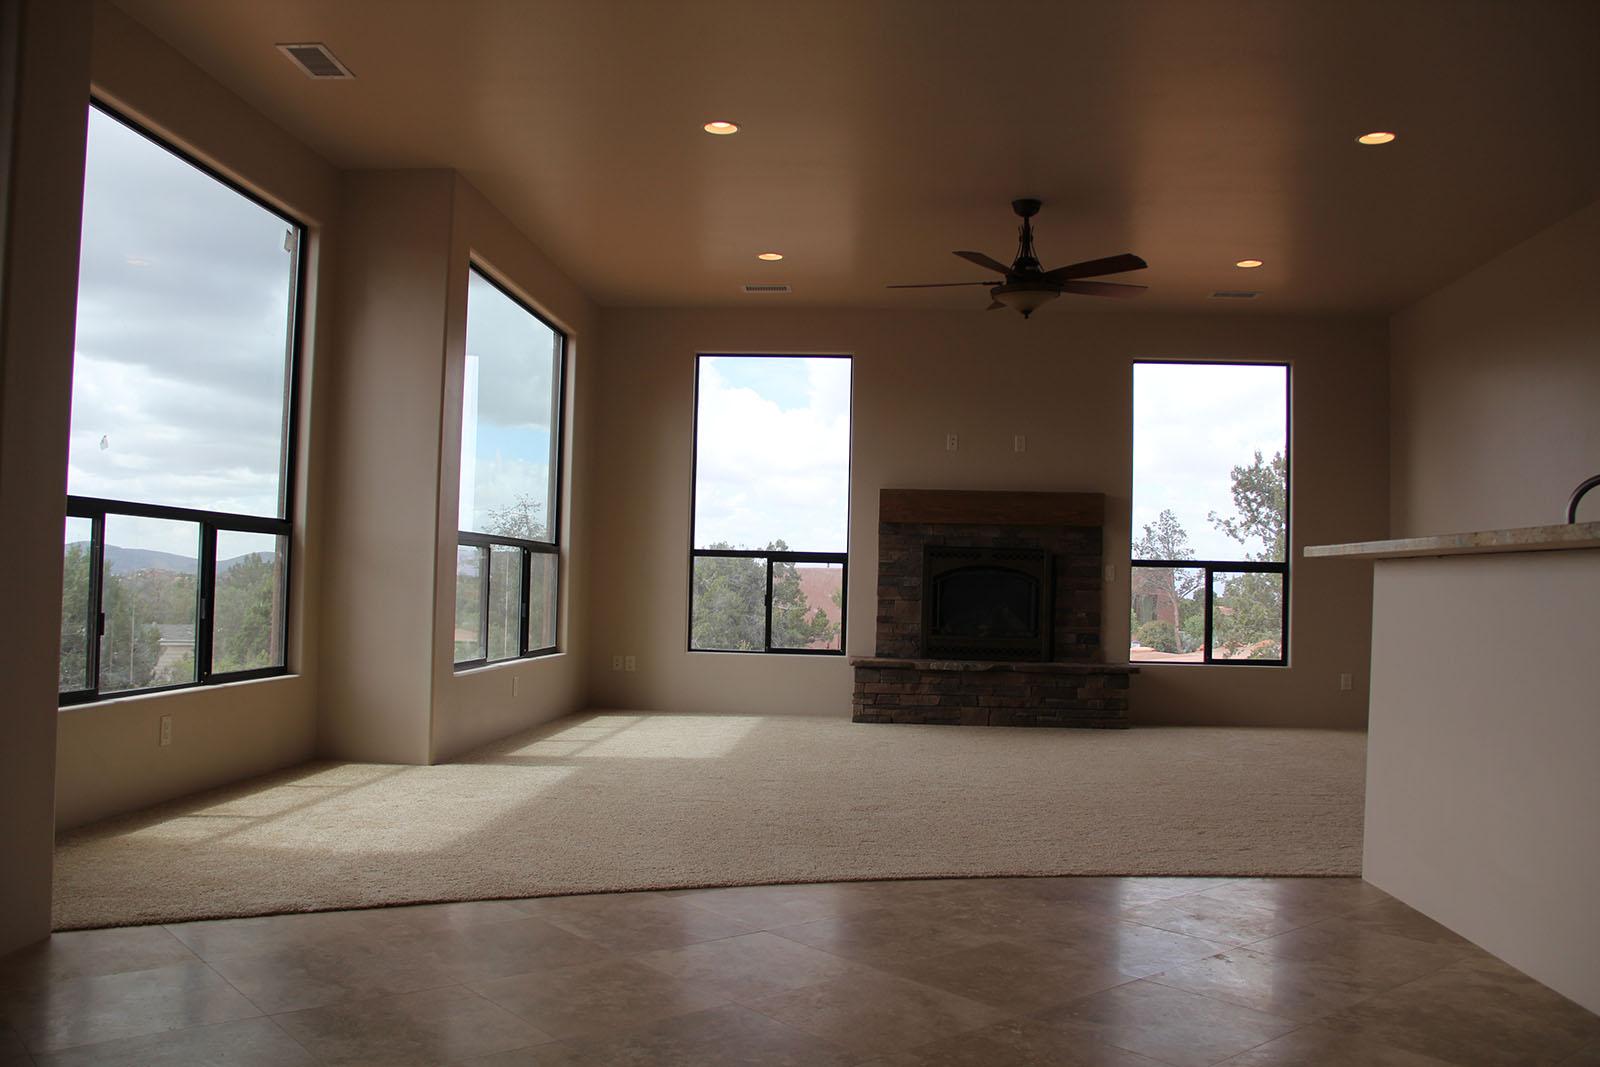 530-windsong-torel-custom-homes-sedona-arizona-0130-jpg